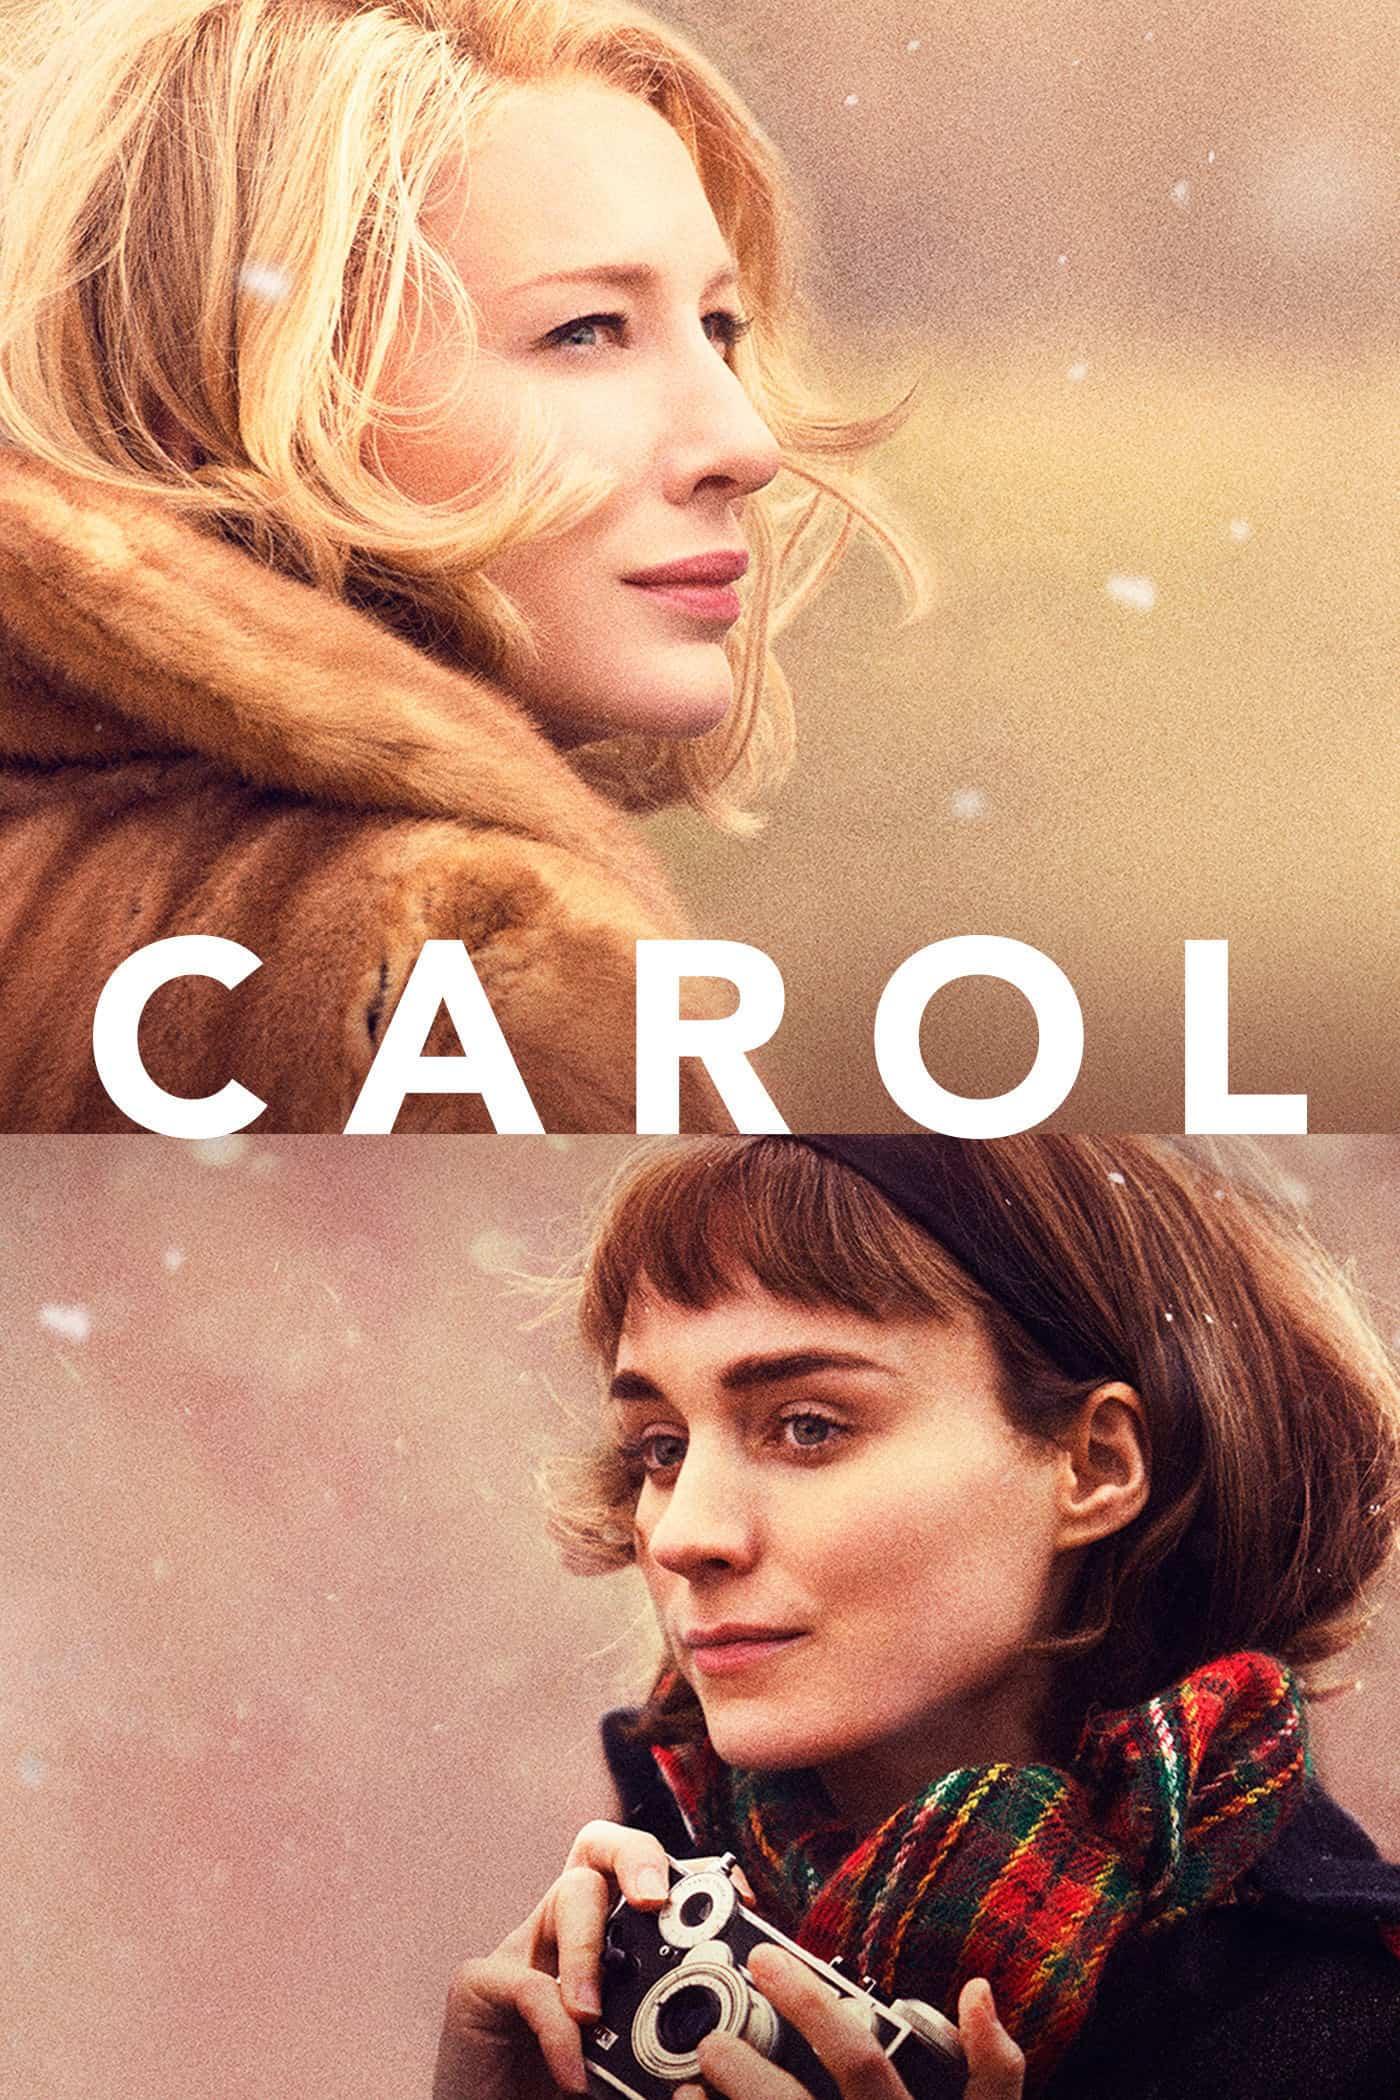 Carol, 2015